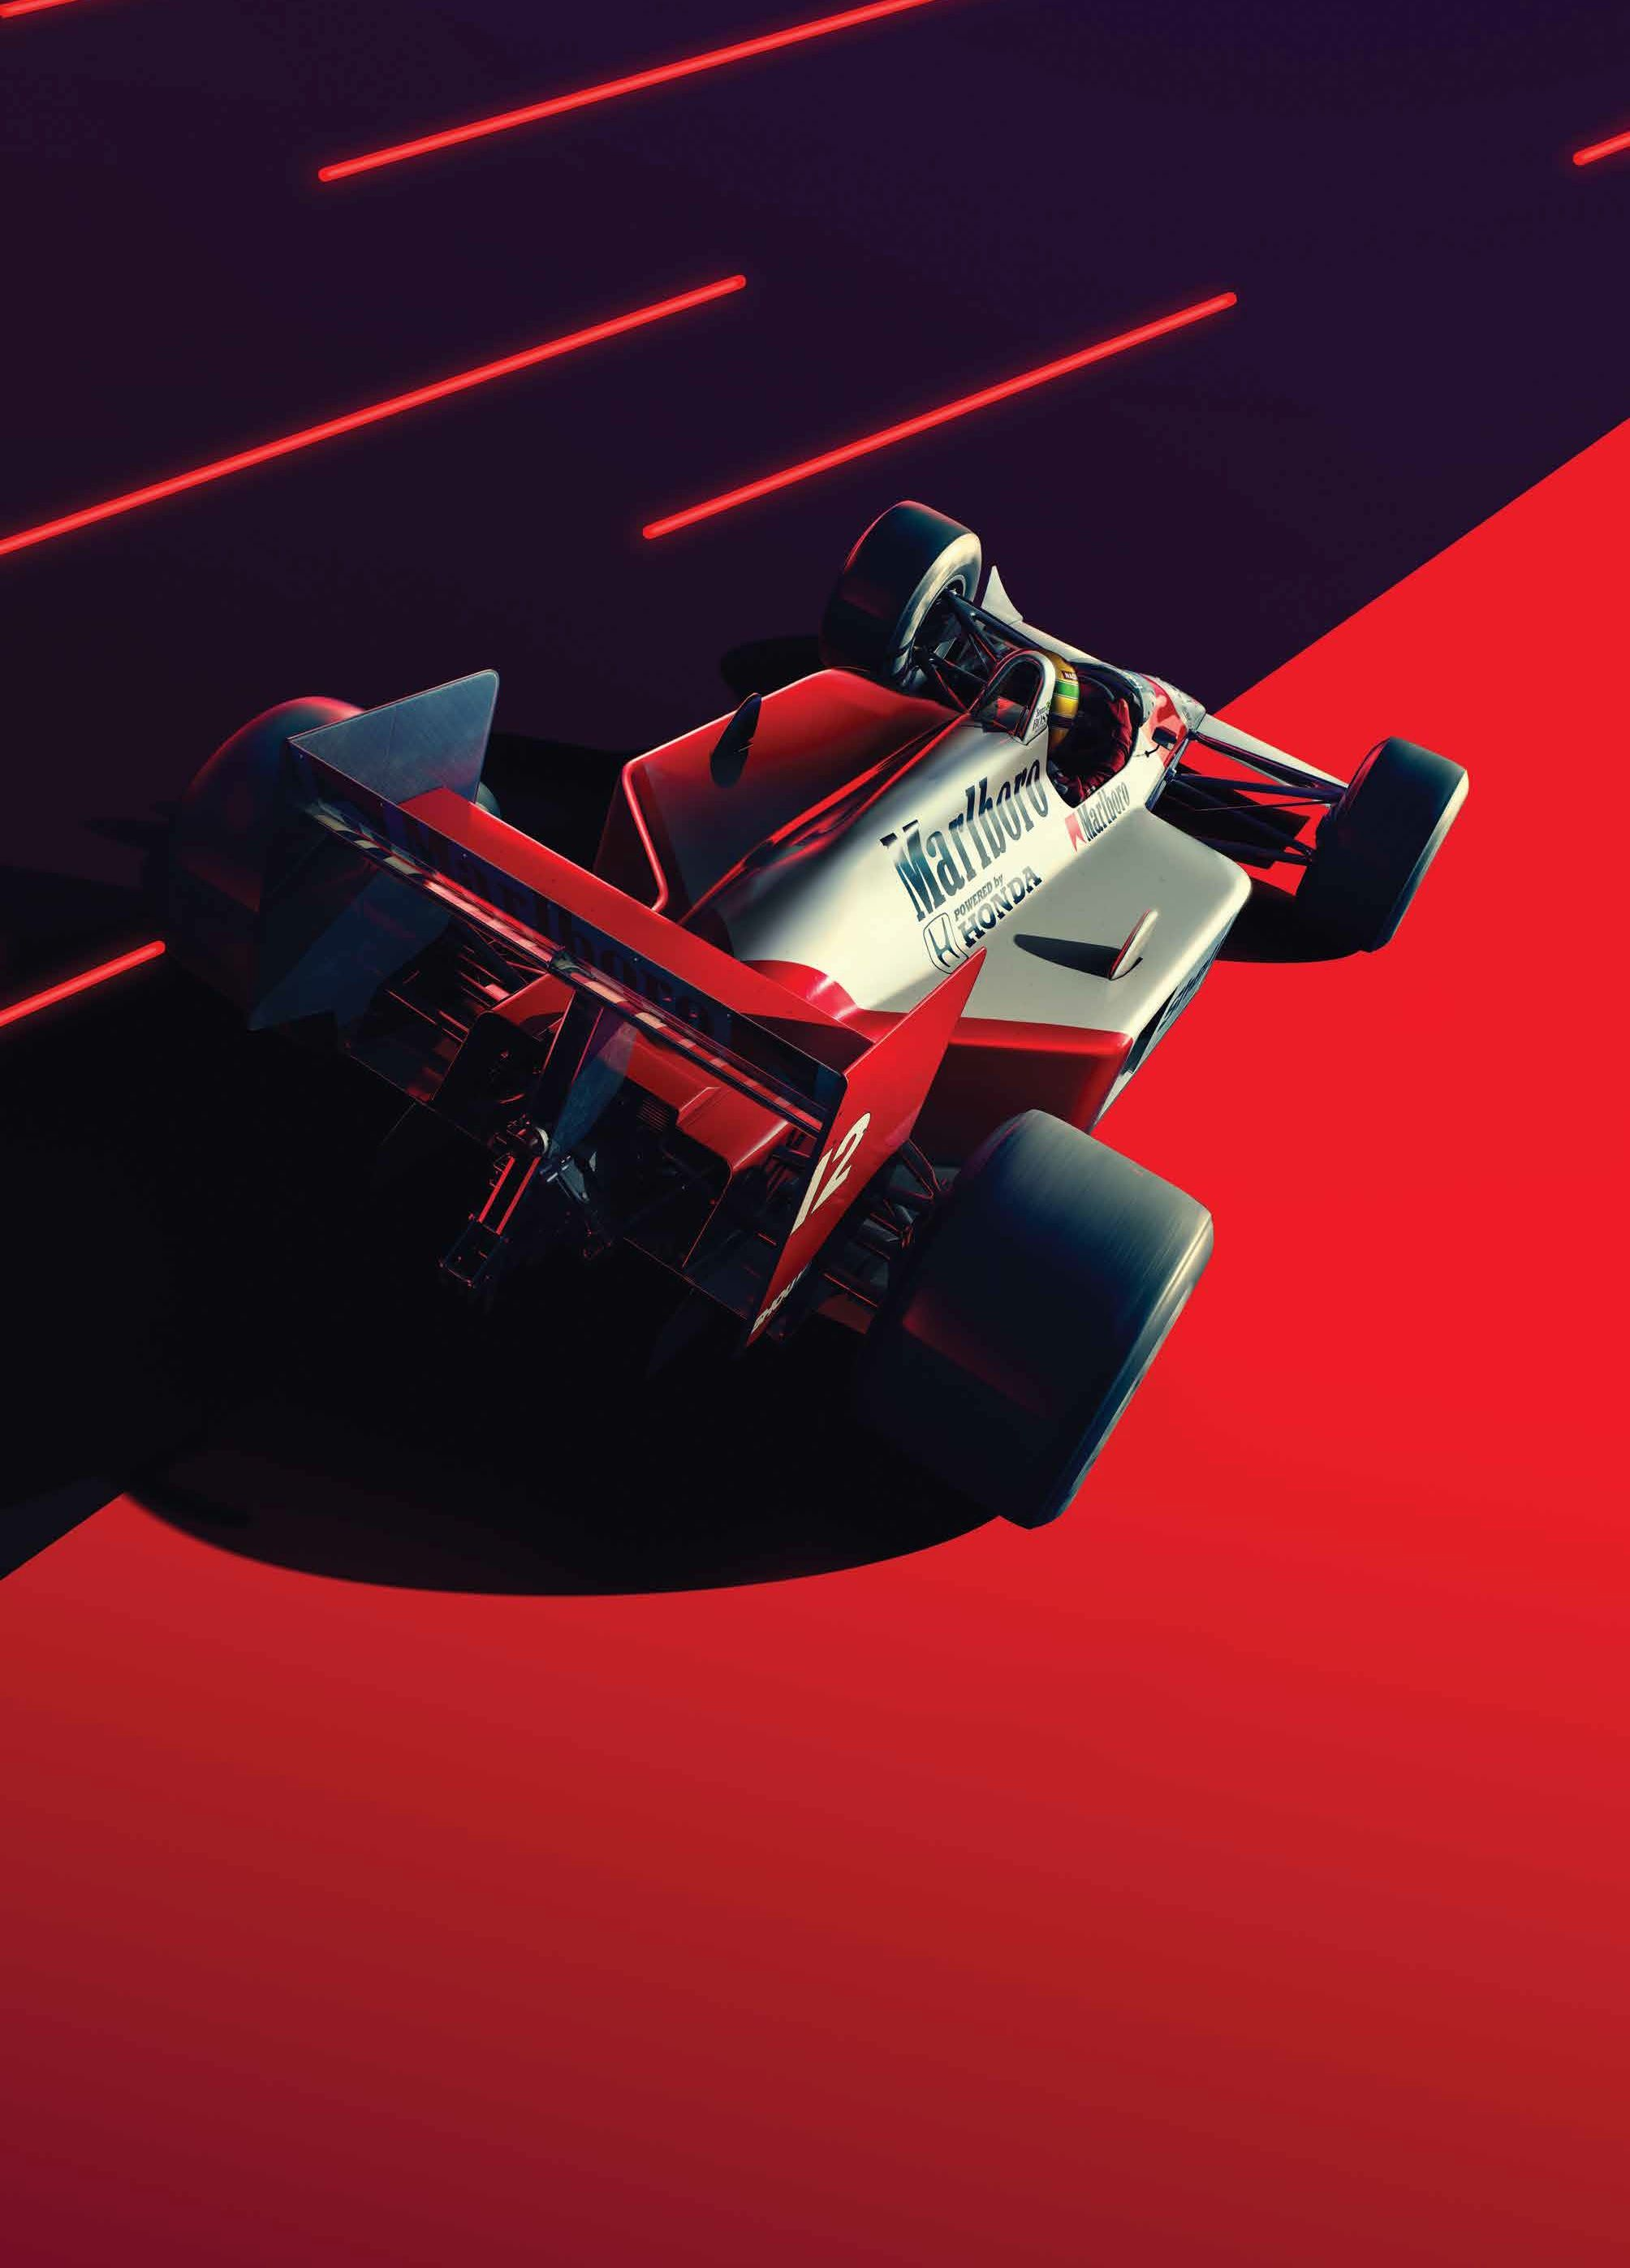 Mclaren And Unique Limited Launch Art Print And Posters Celebrating Ayrton Senna Ayrton Exposicao De Carros Antigos